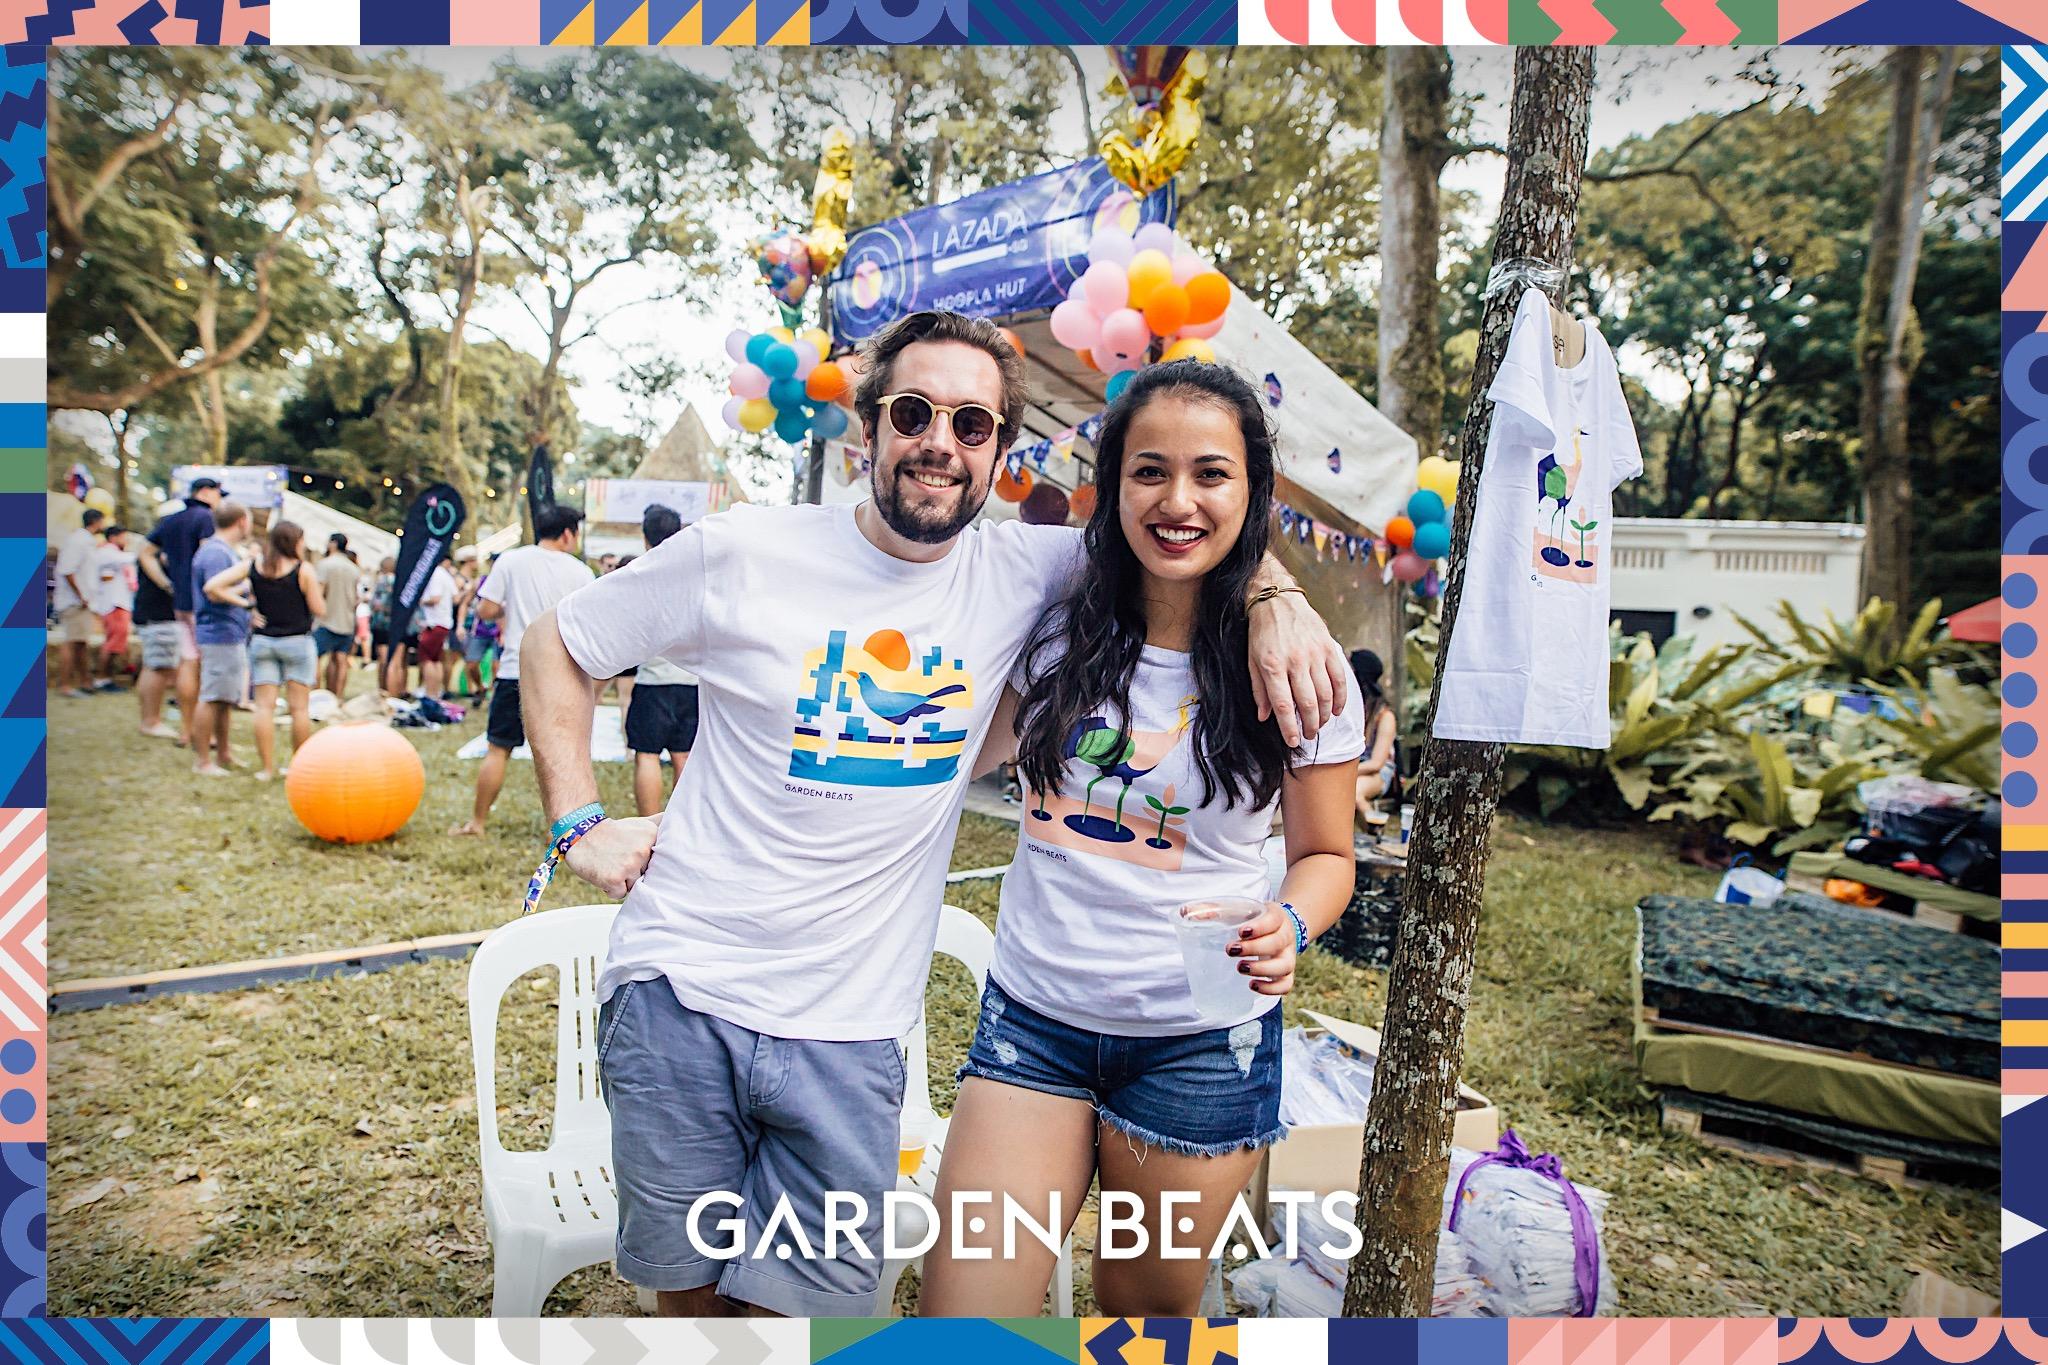 18032017_GardenBeats_Colossal575_WatermarkedGB.jpg